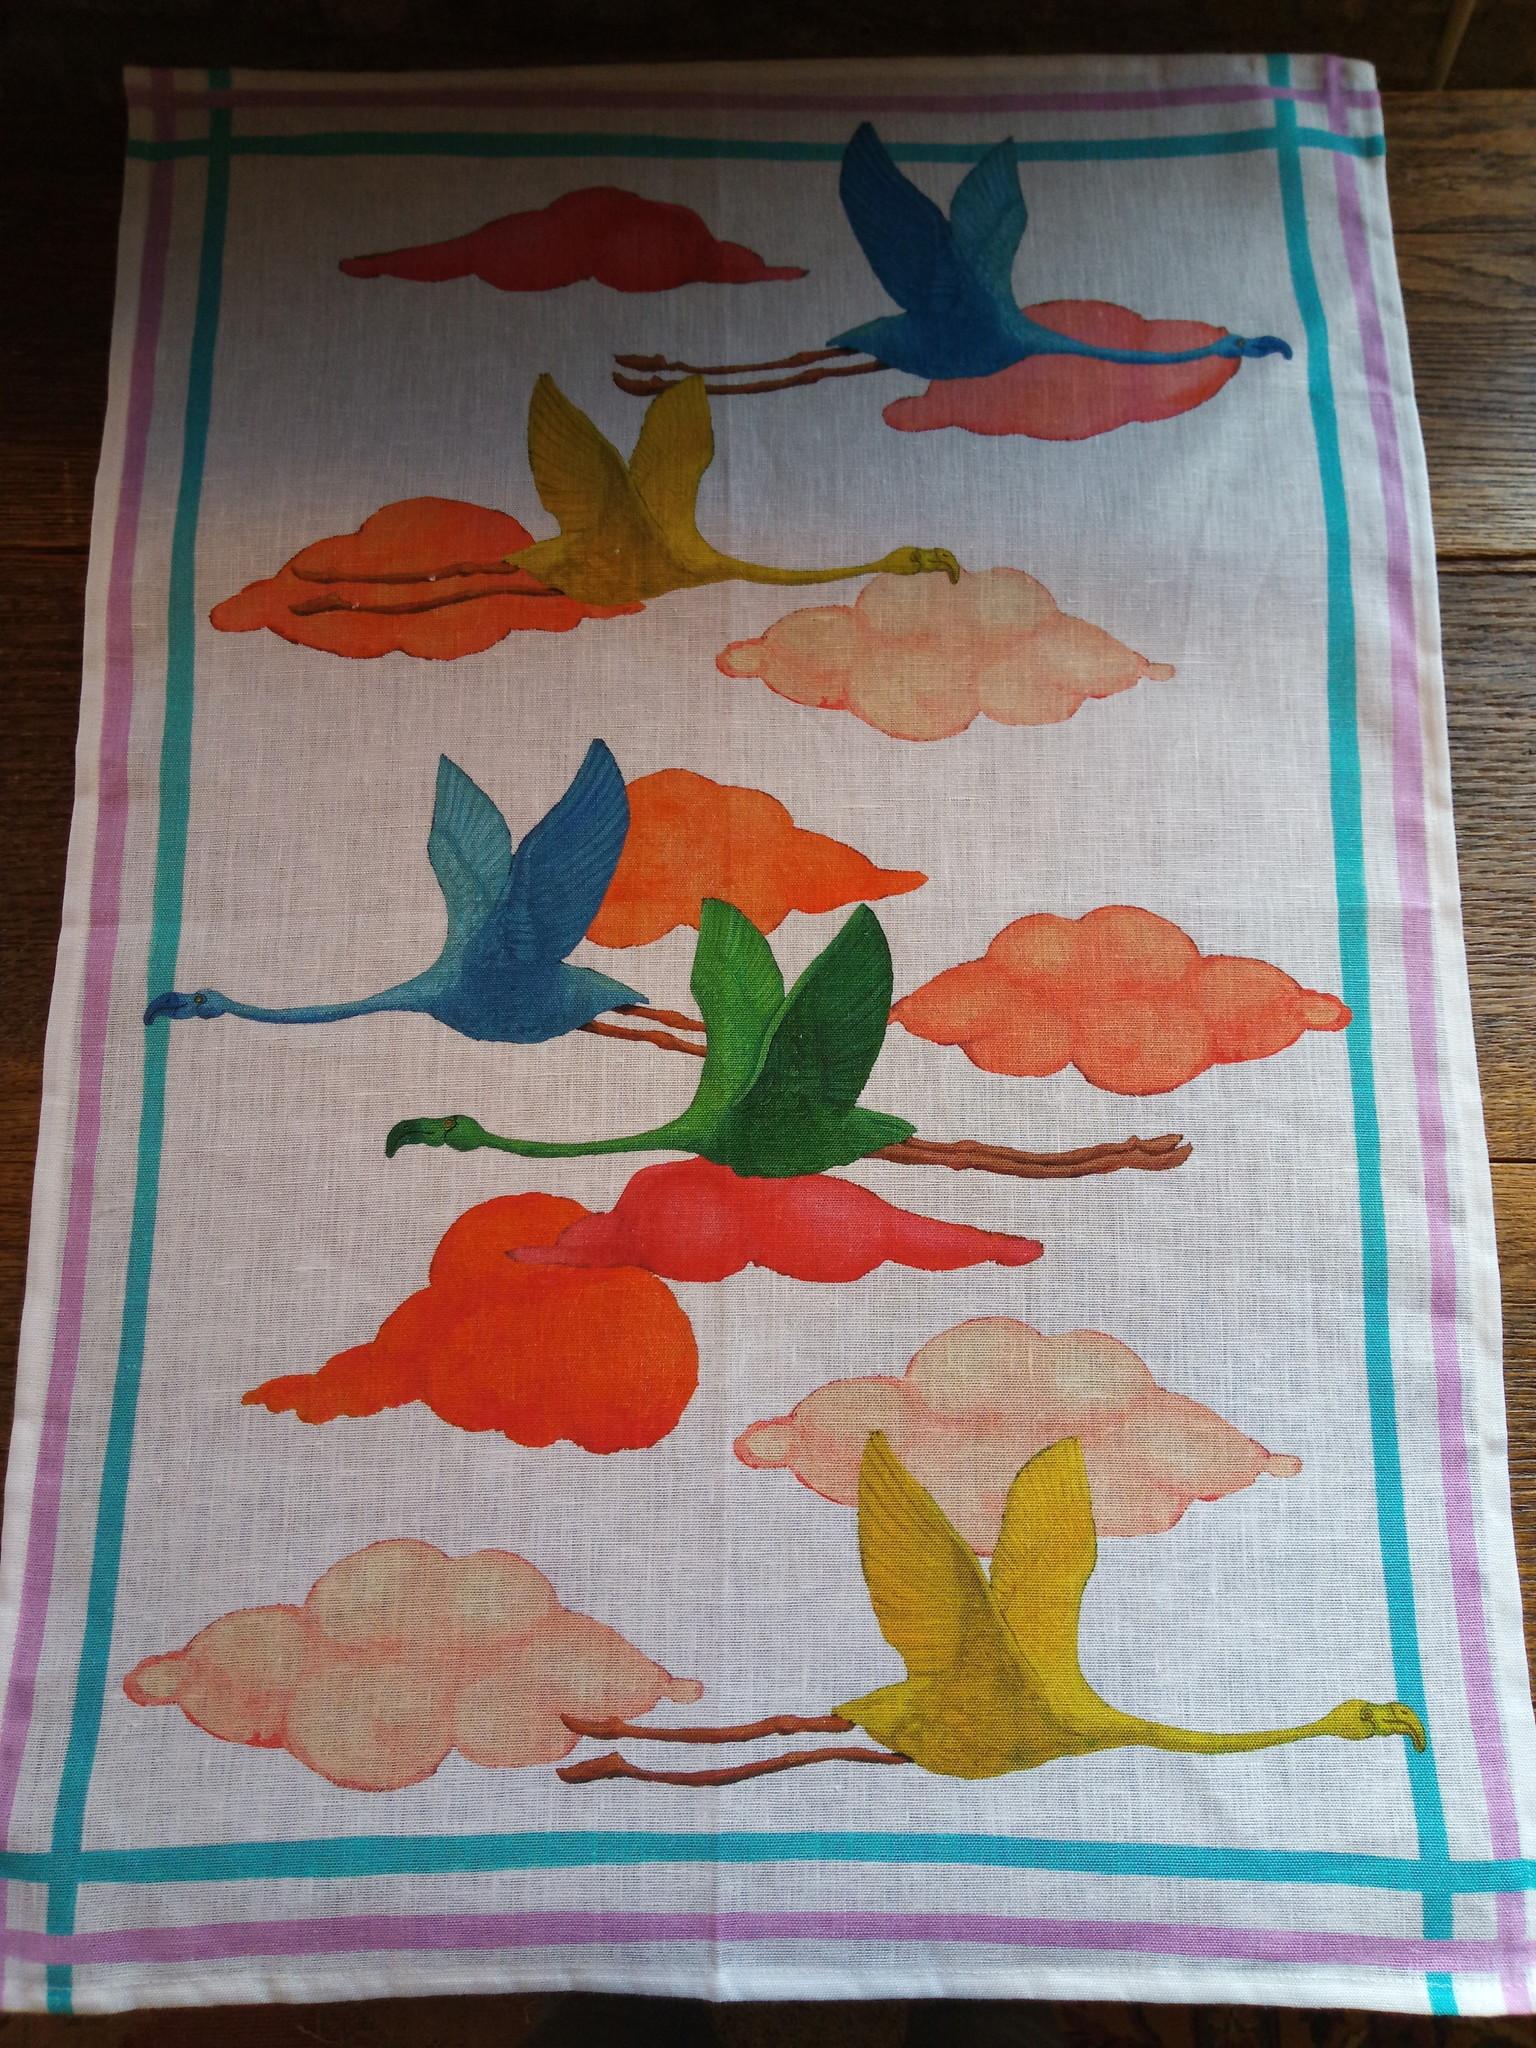 "Flamingo"" tea towel"